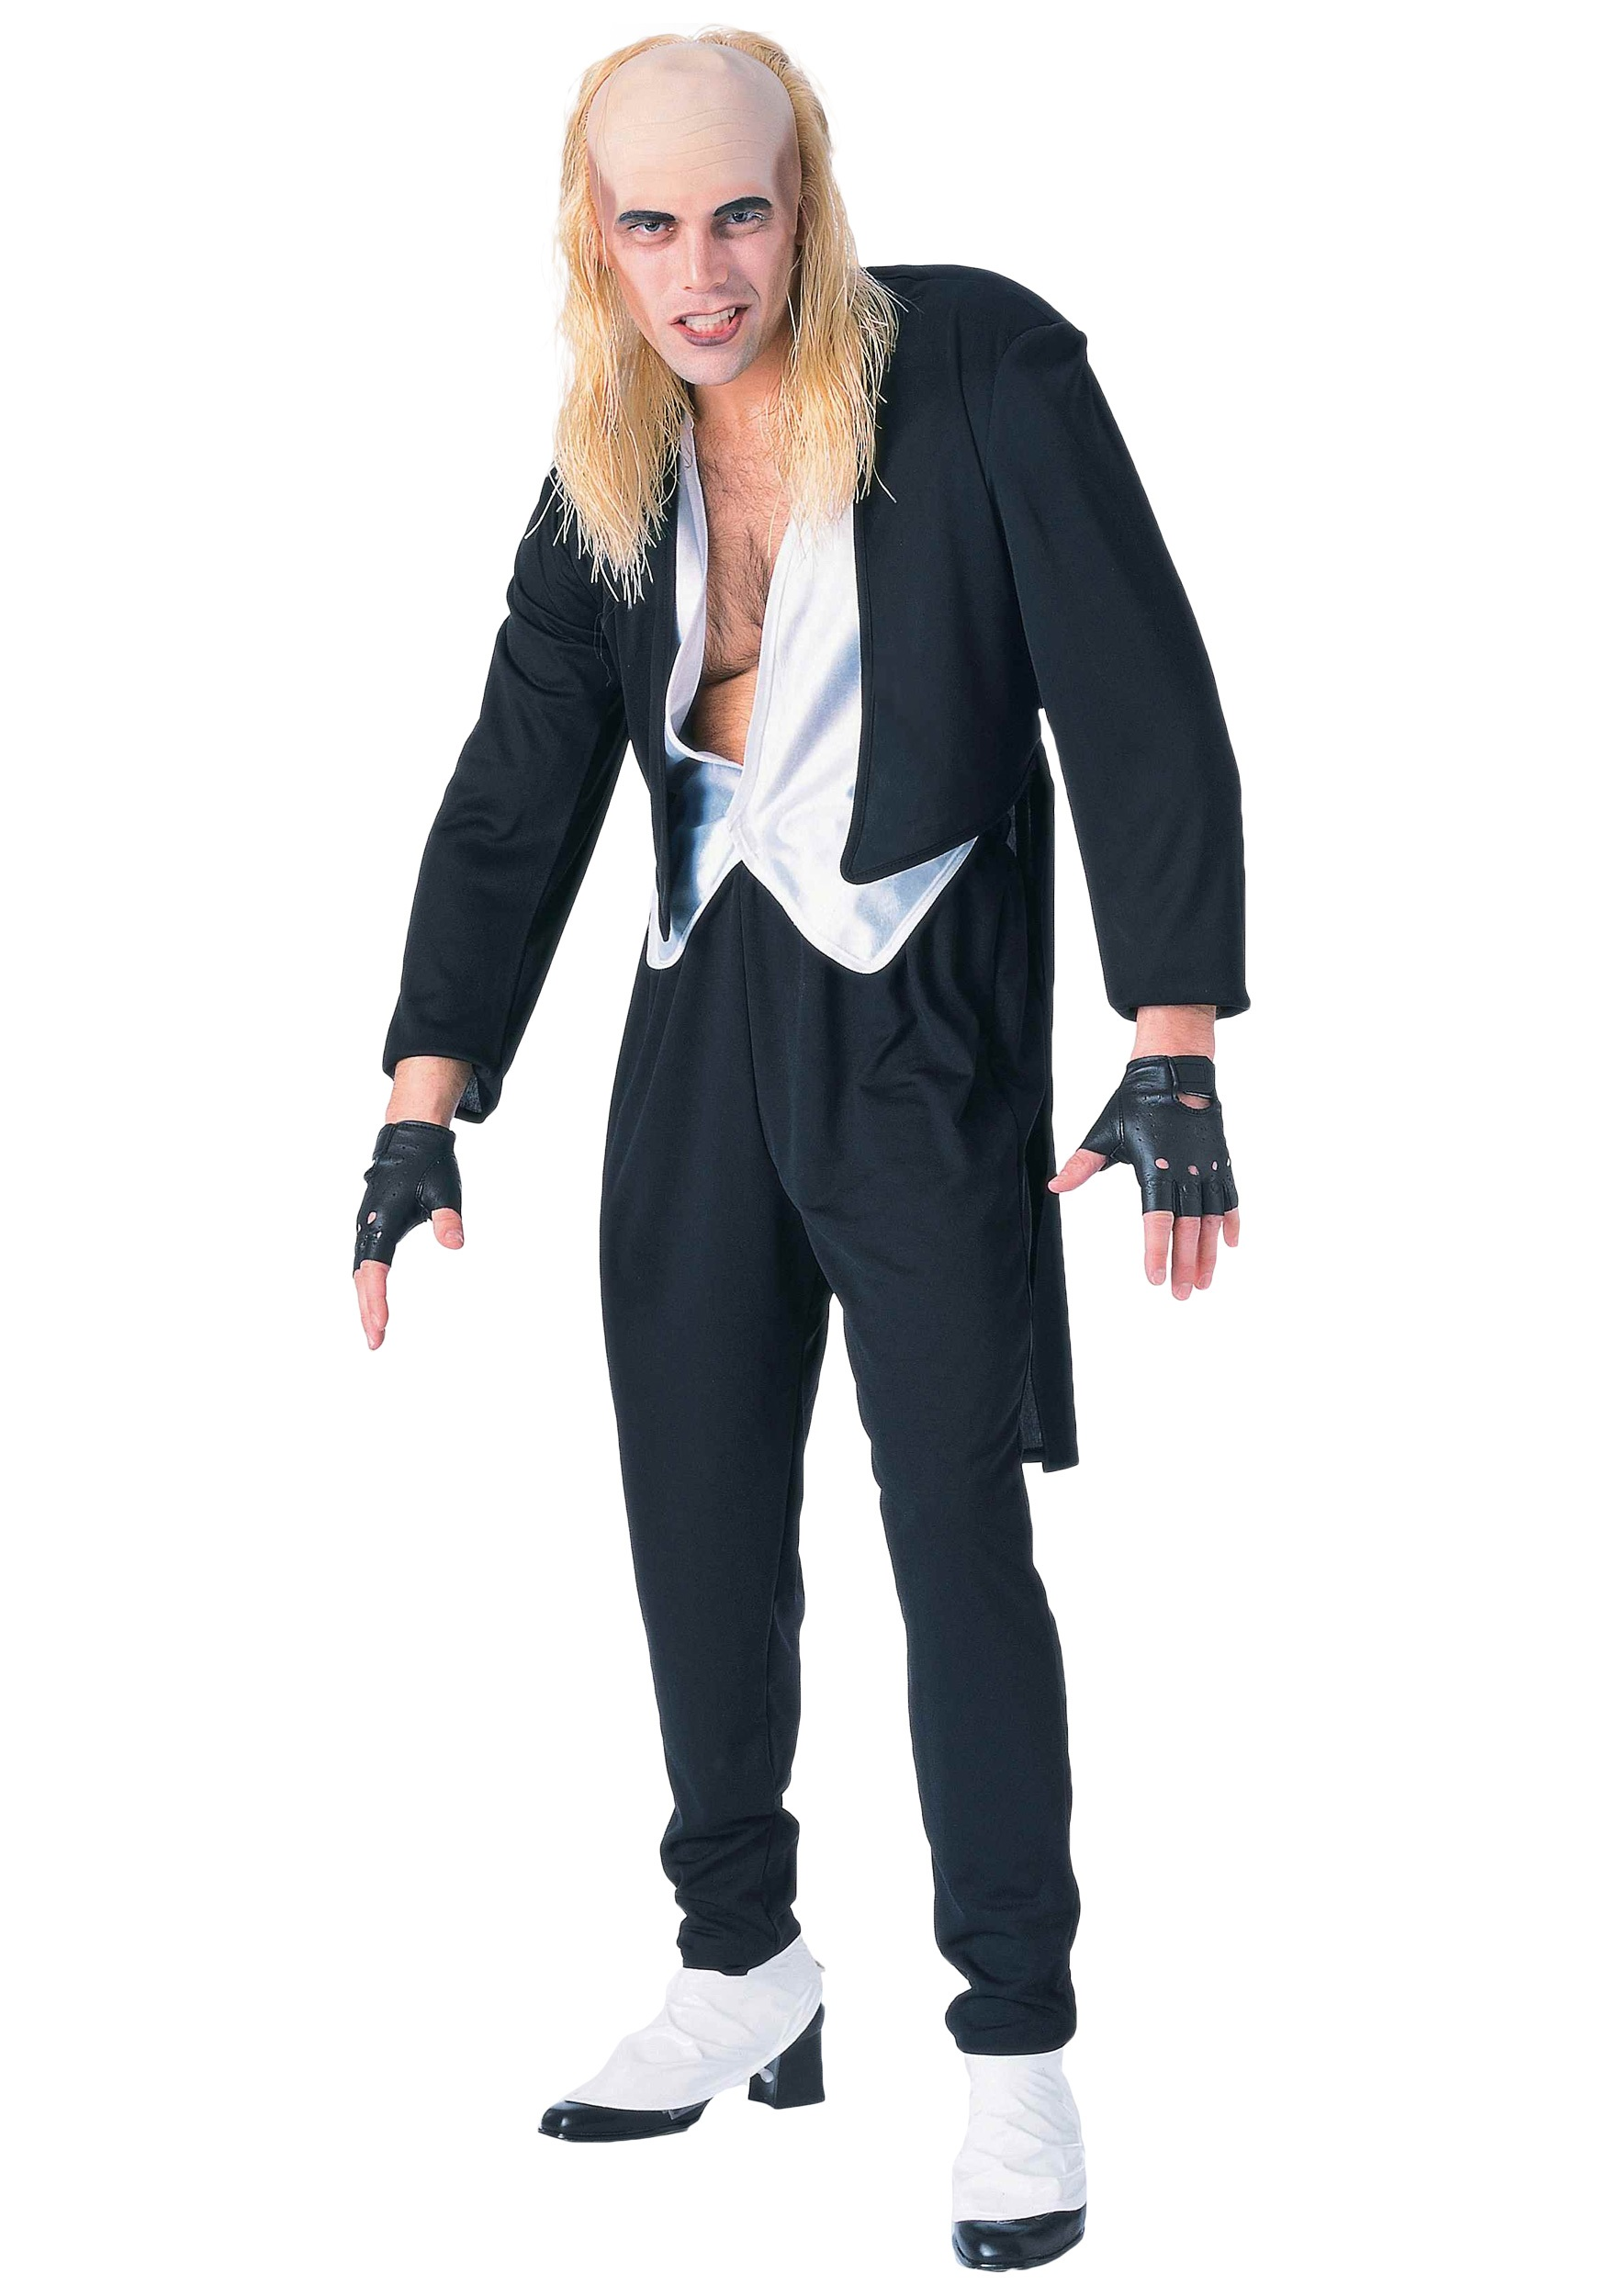 riff raff costume - halloween costumes